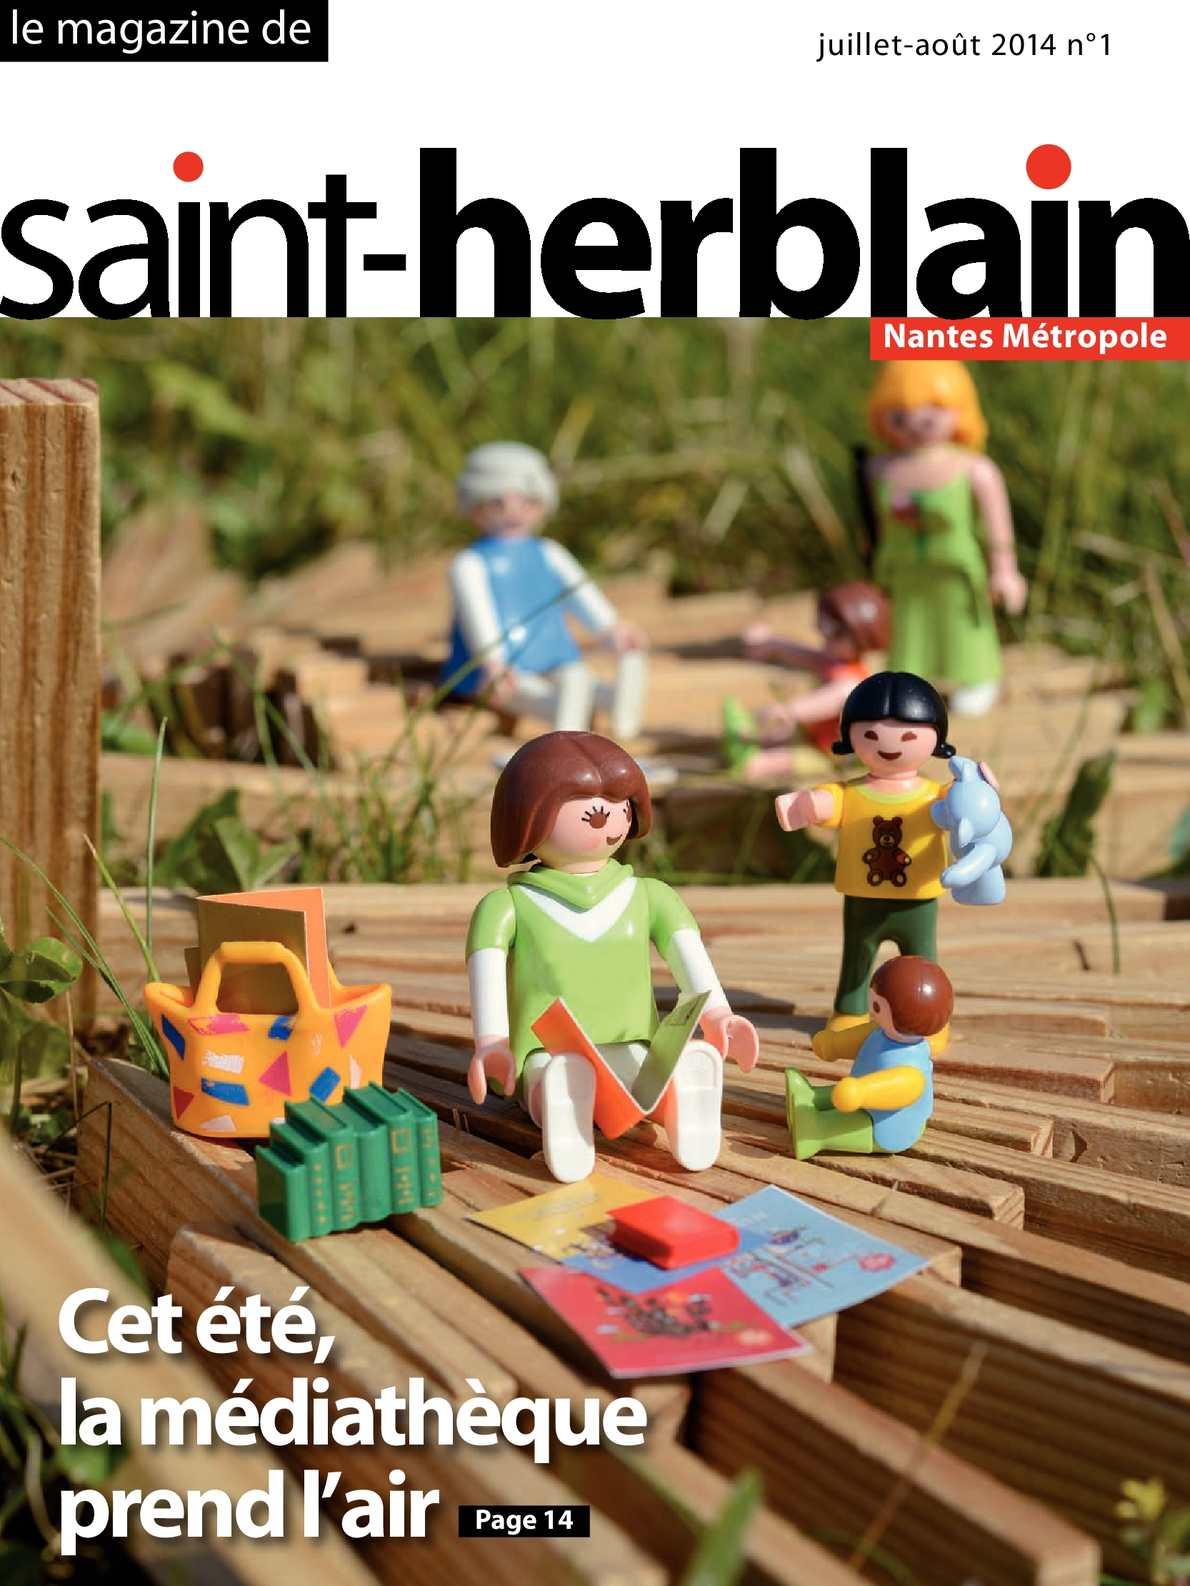 calam o 1 le magazine de saint herblain. Black Bedroom Furniture Sets. Home Design Ideas